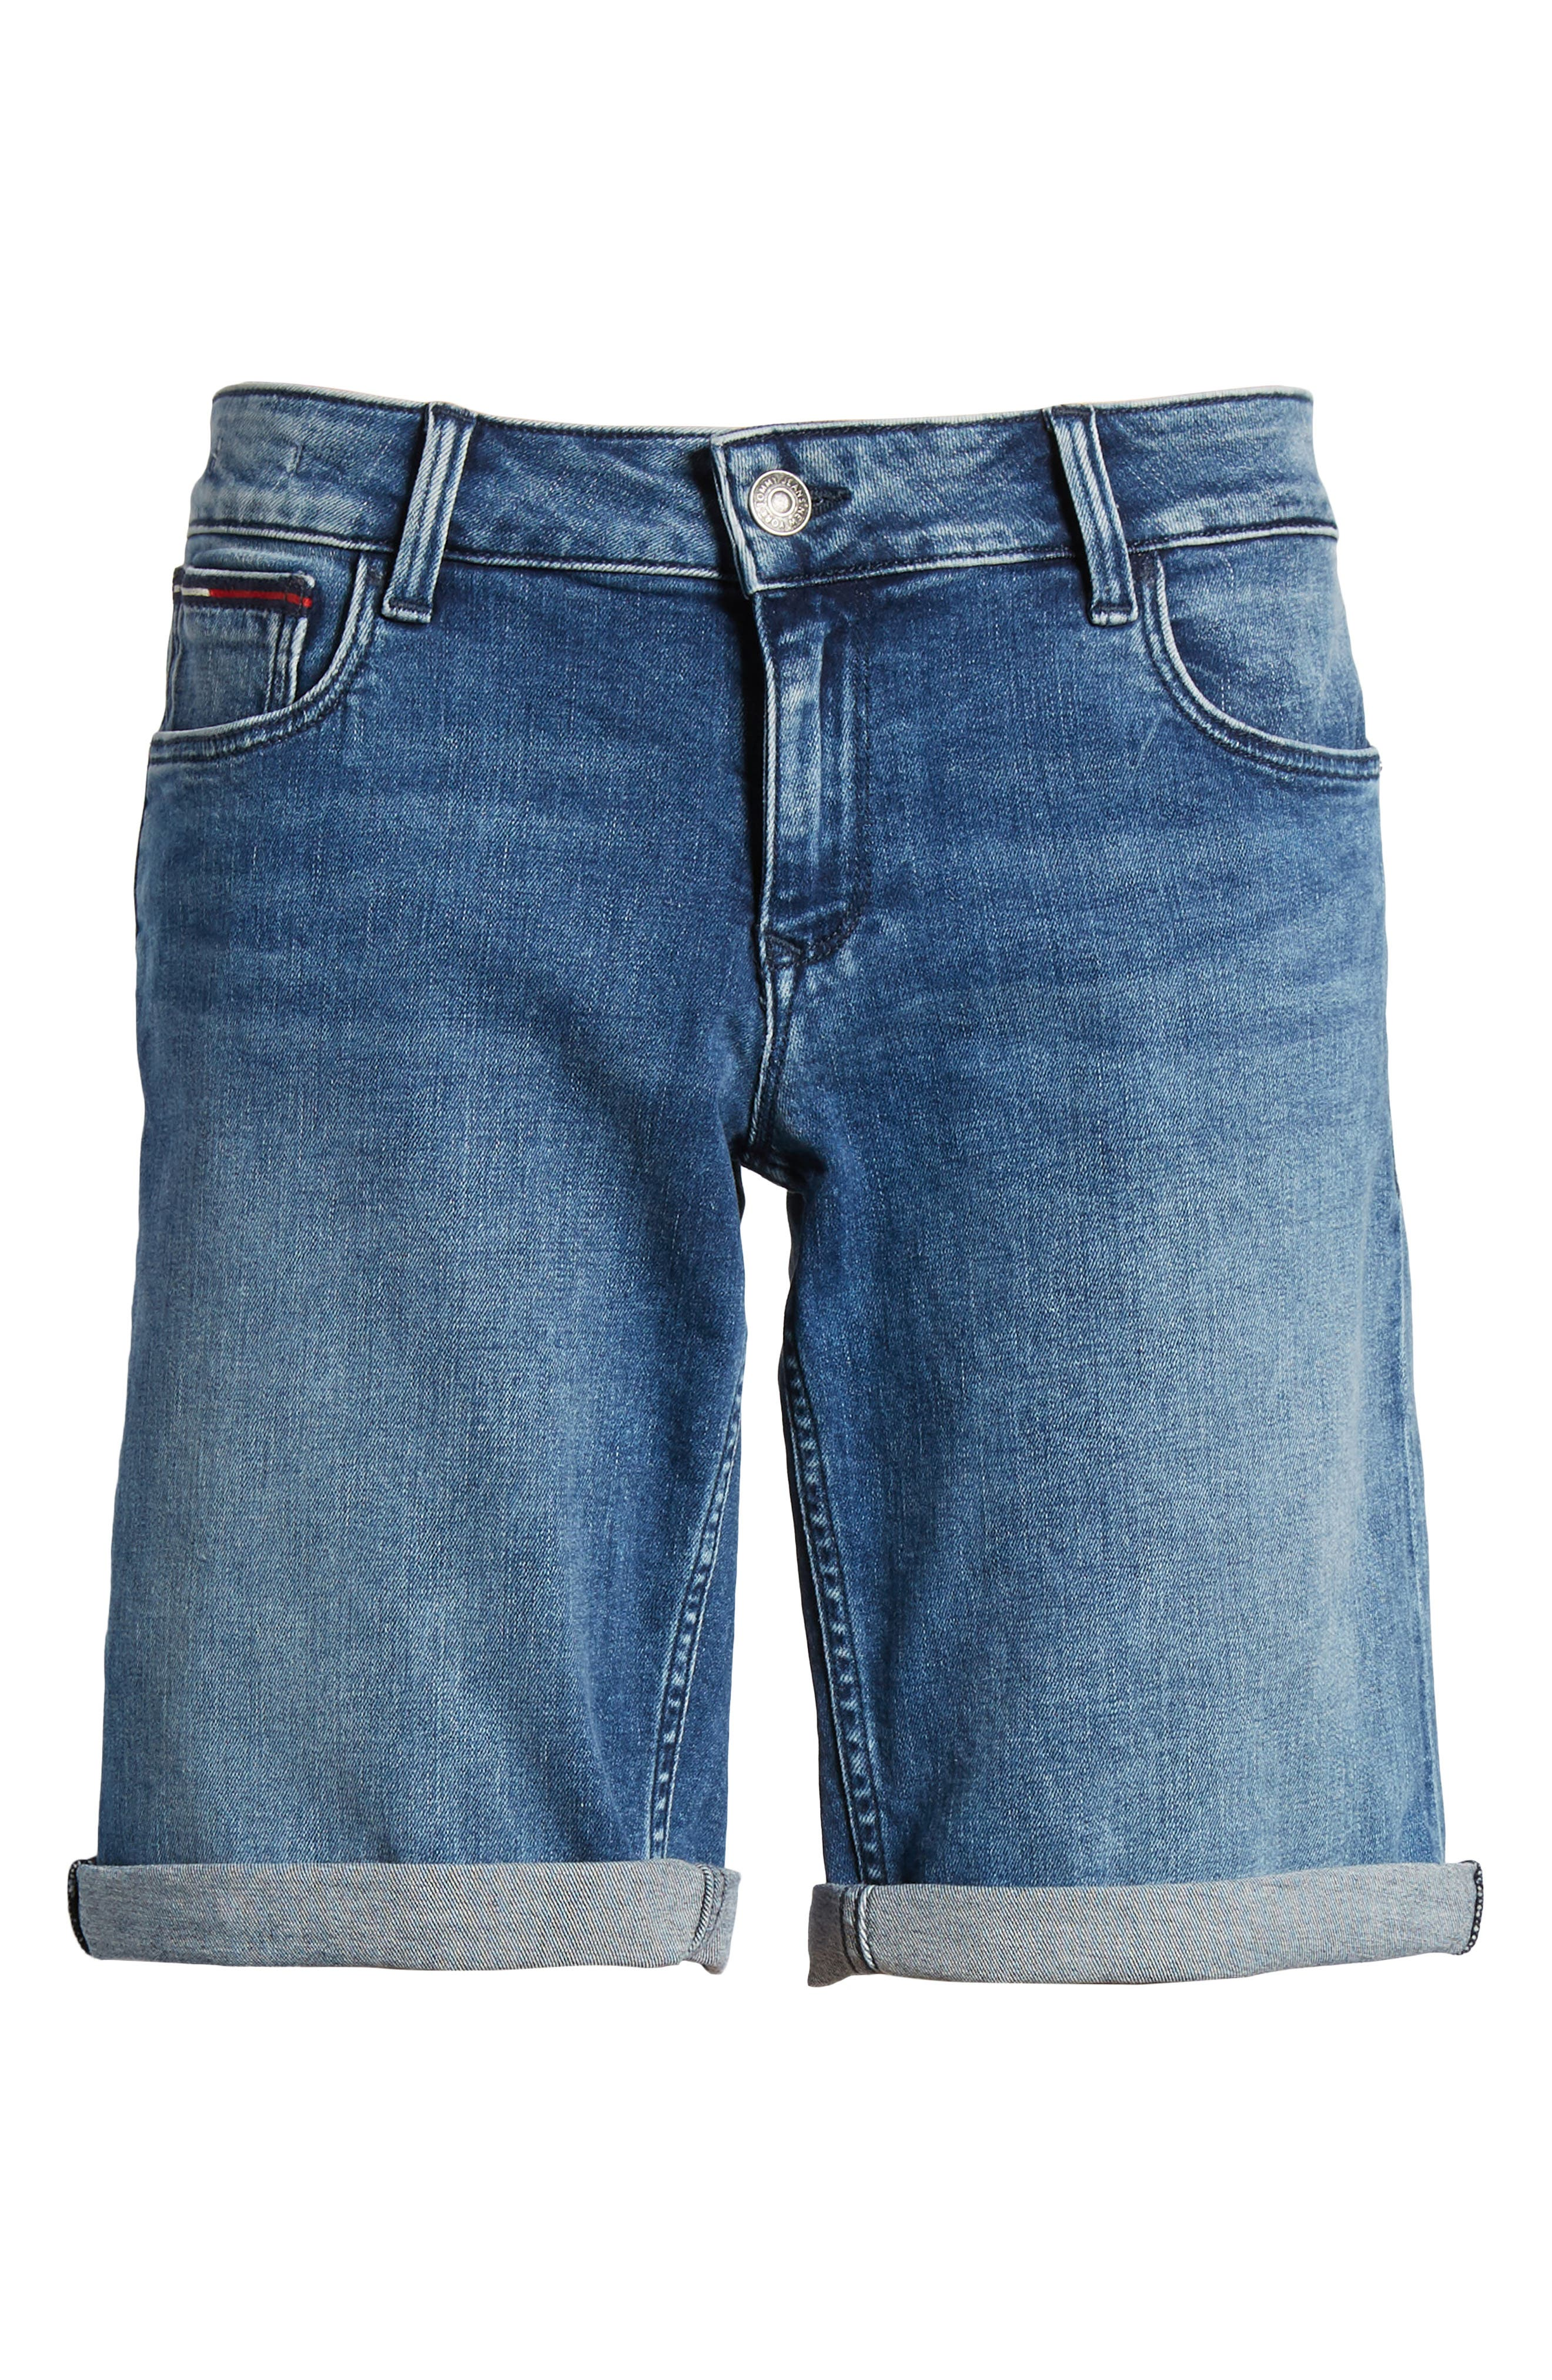 Classic Long Denim Shorts,                             Alternate thumbnail 8, color,                             Newport Mid Blue Str